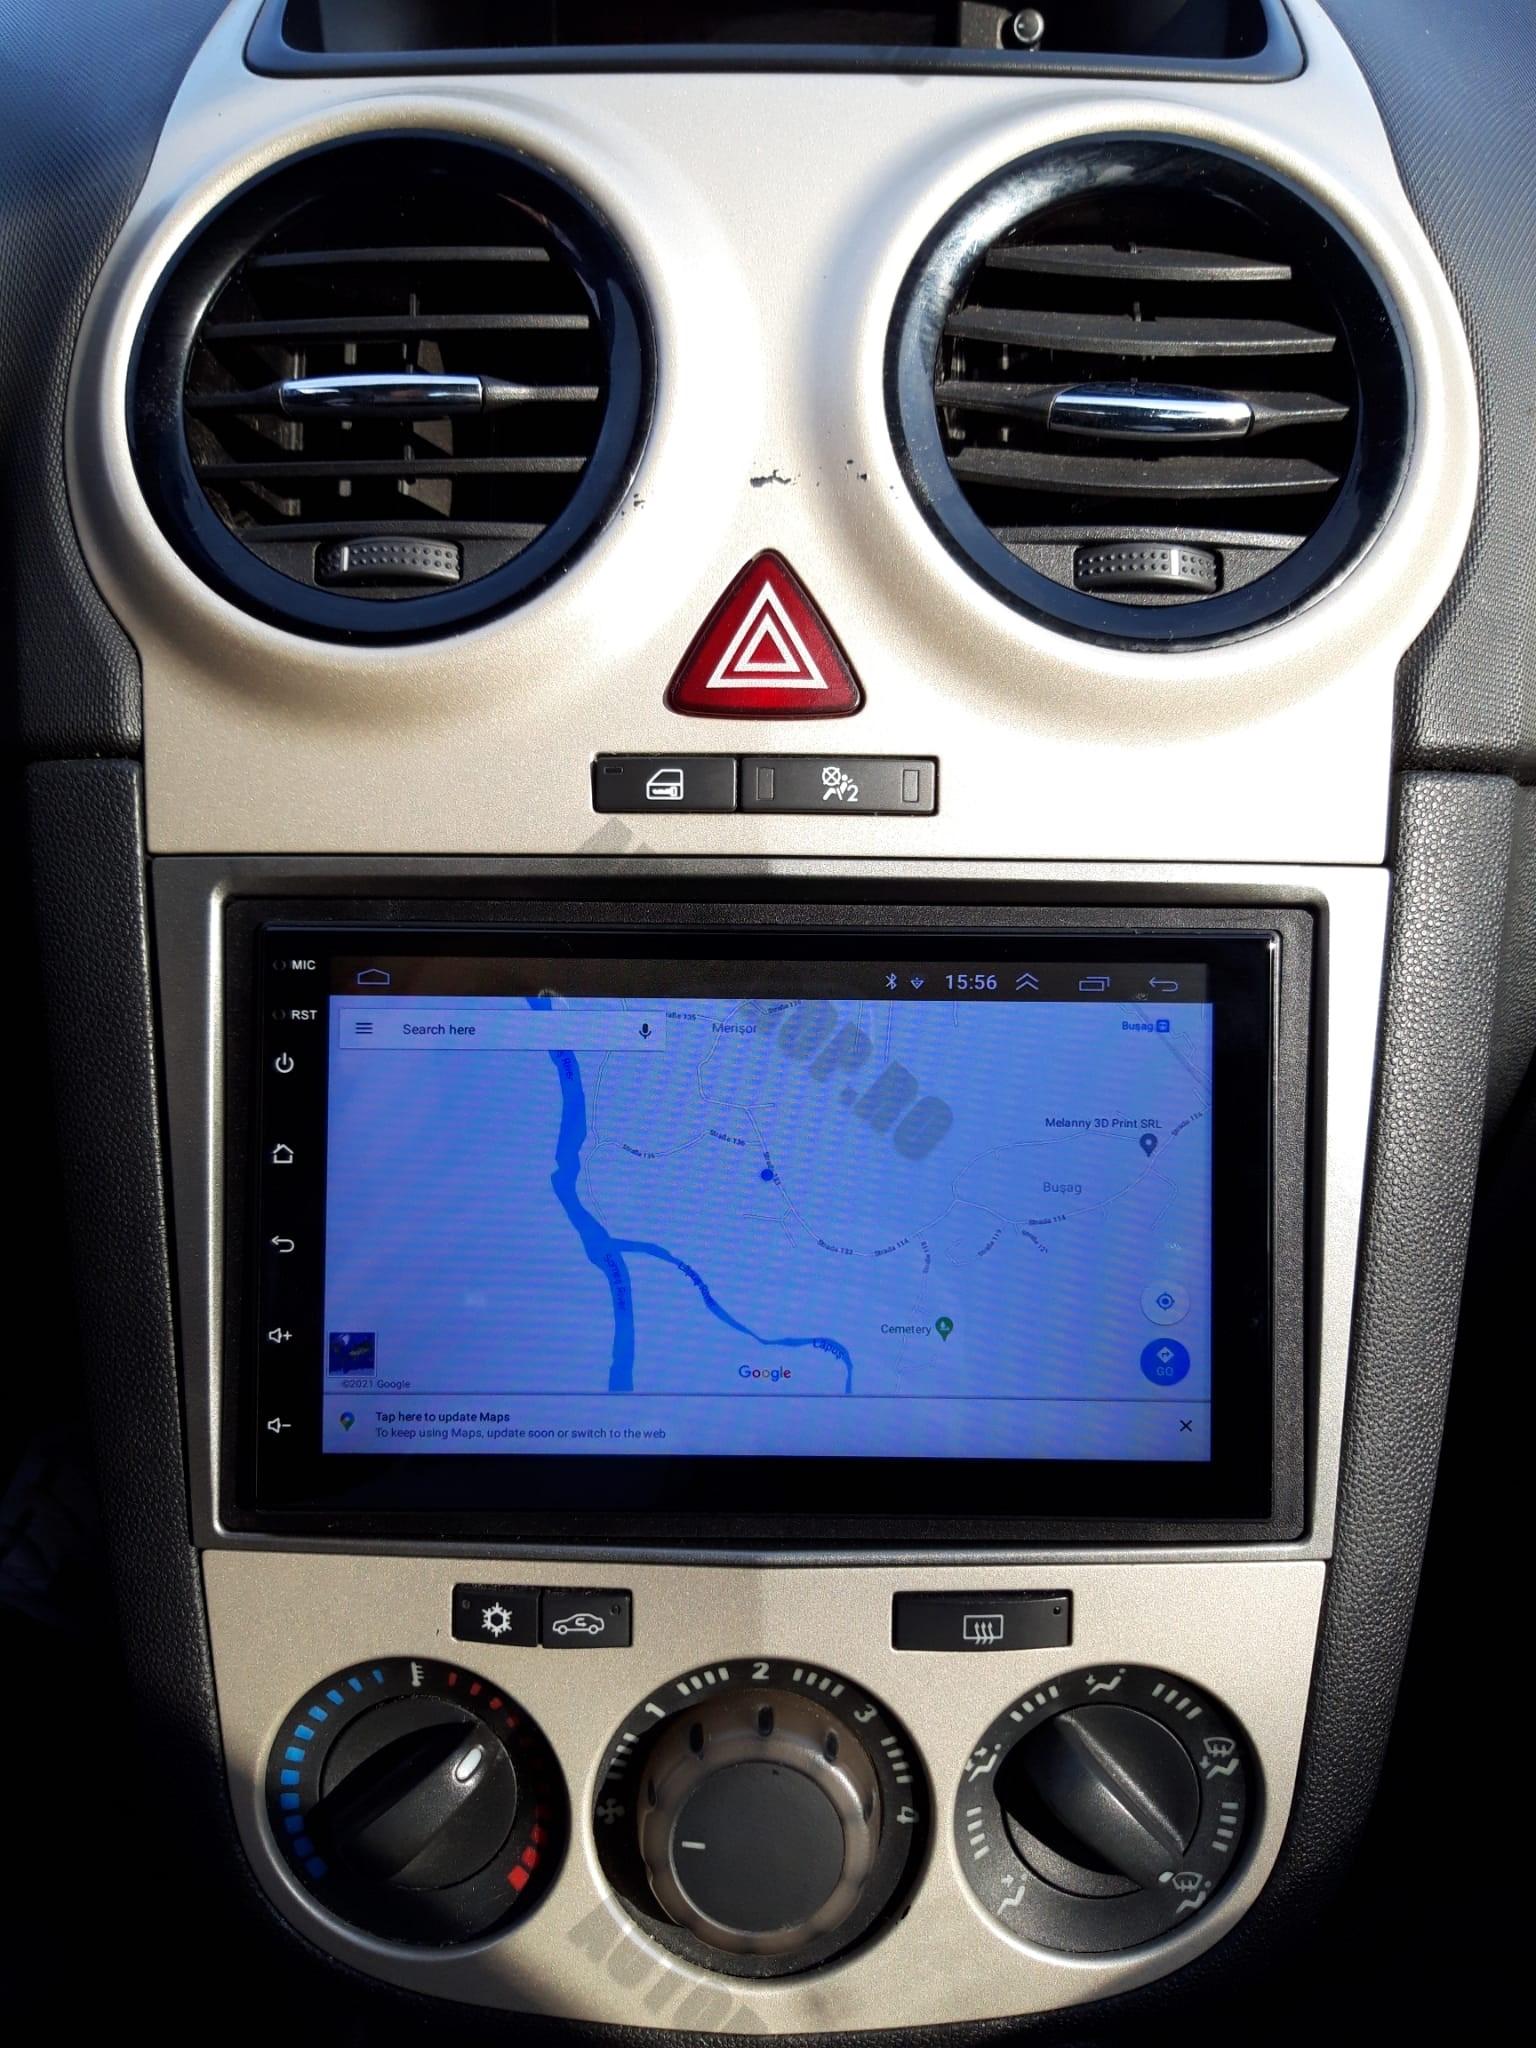 configuratie-ad-bgp1001-android-navigatie-universala-1094 b